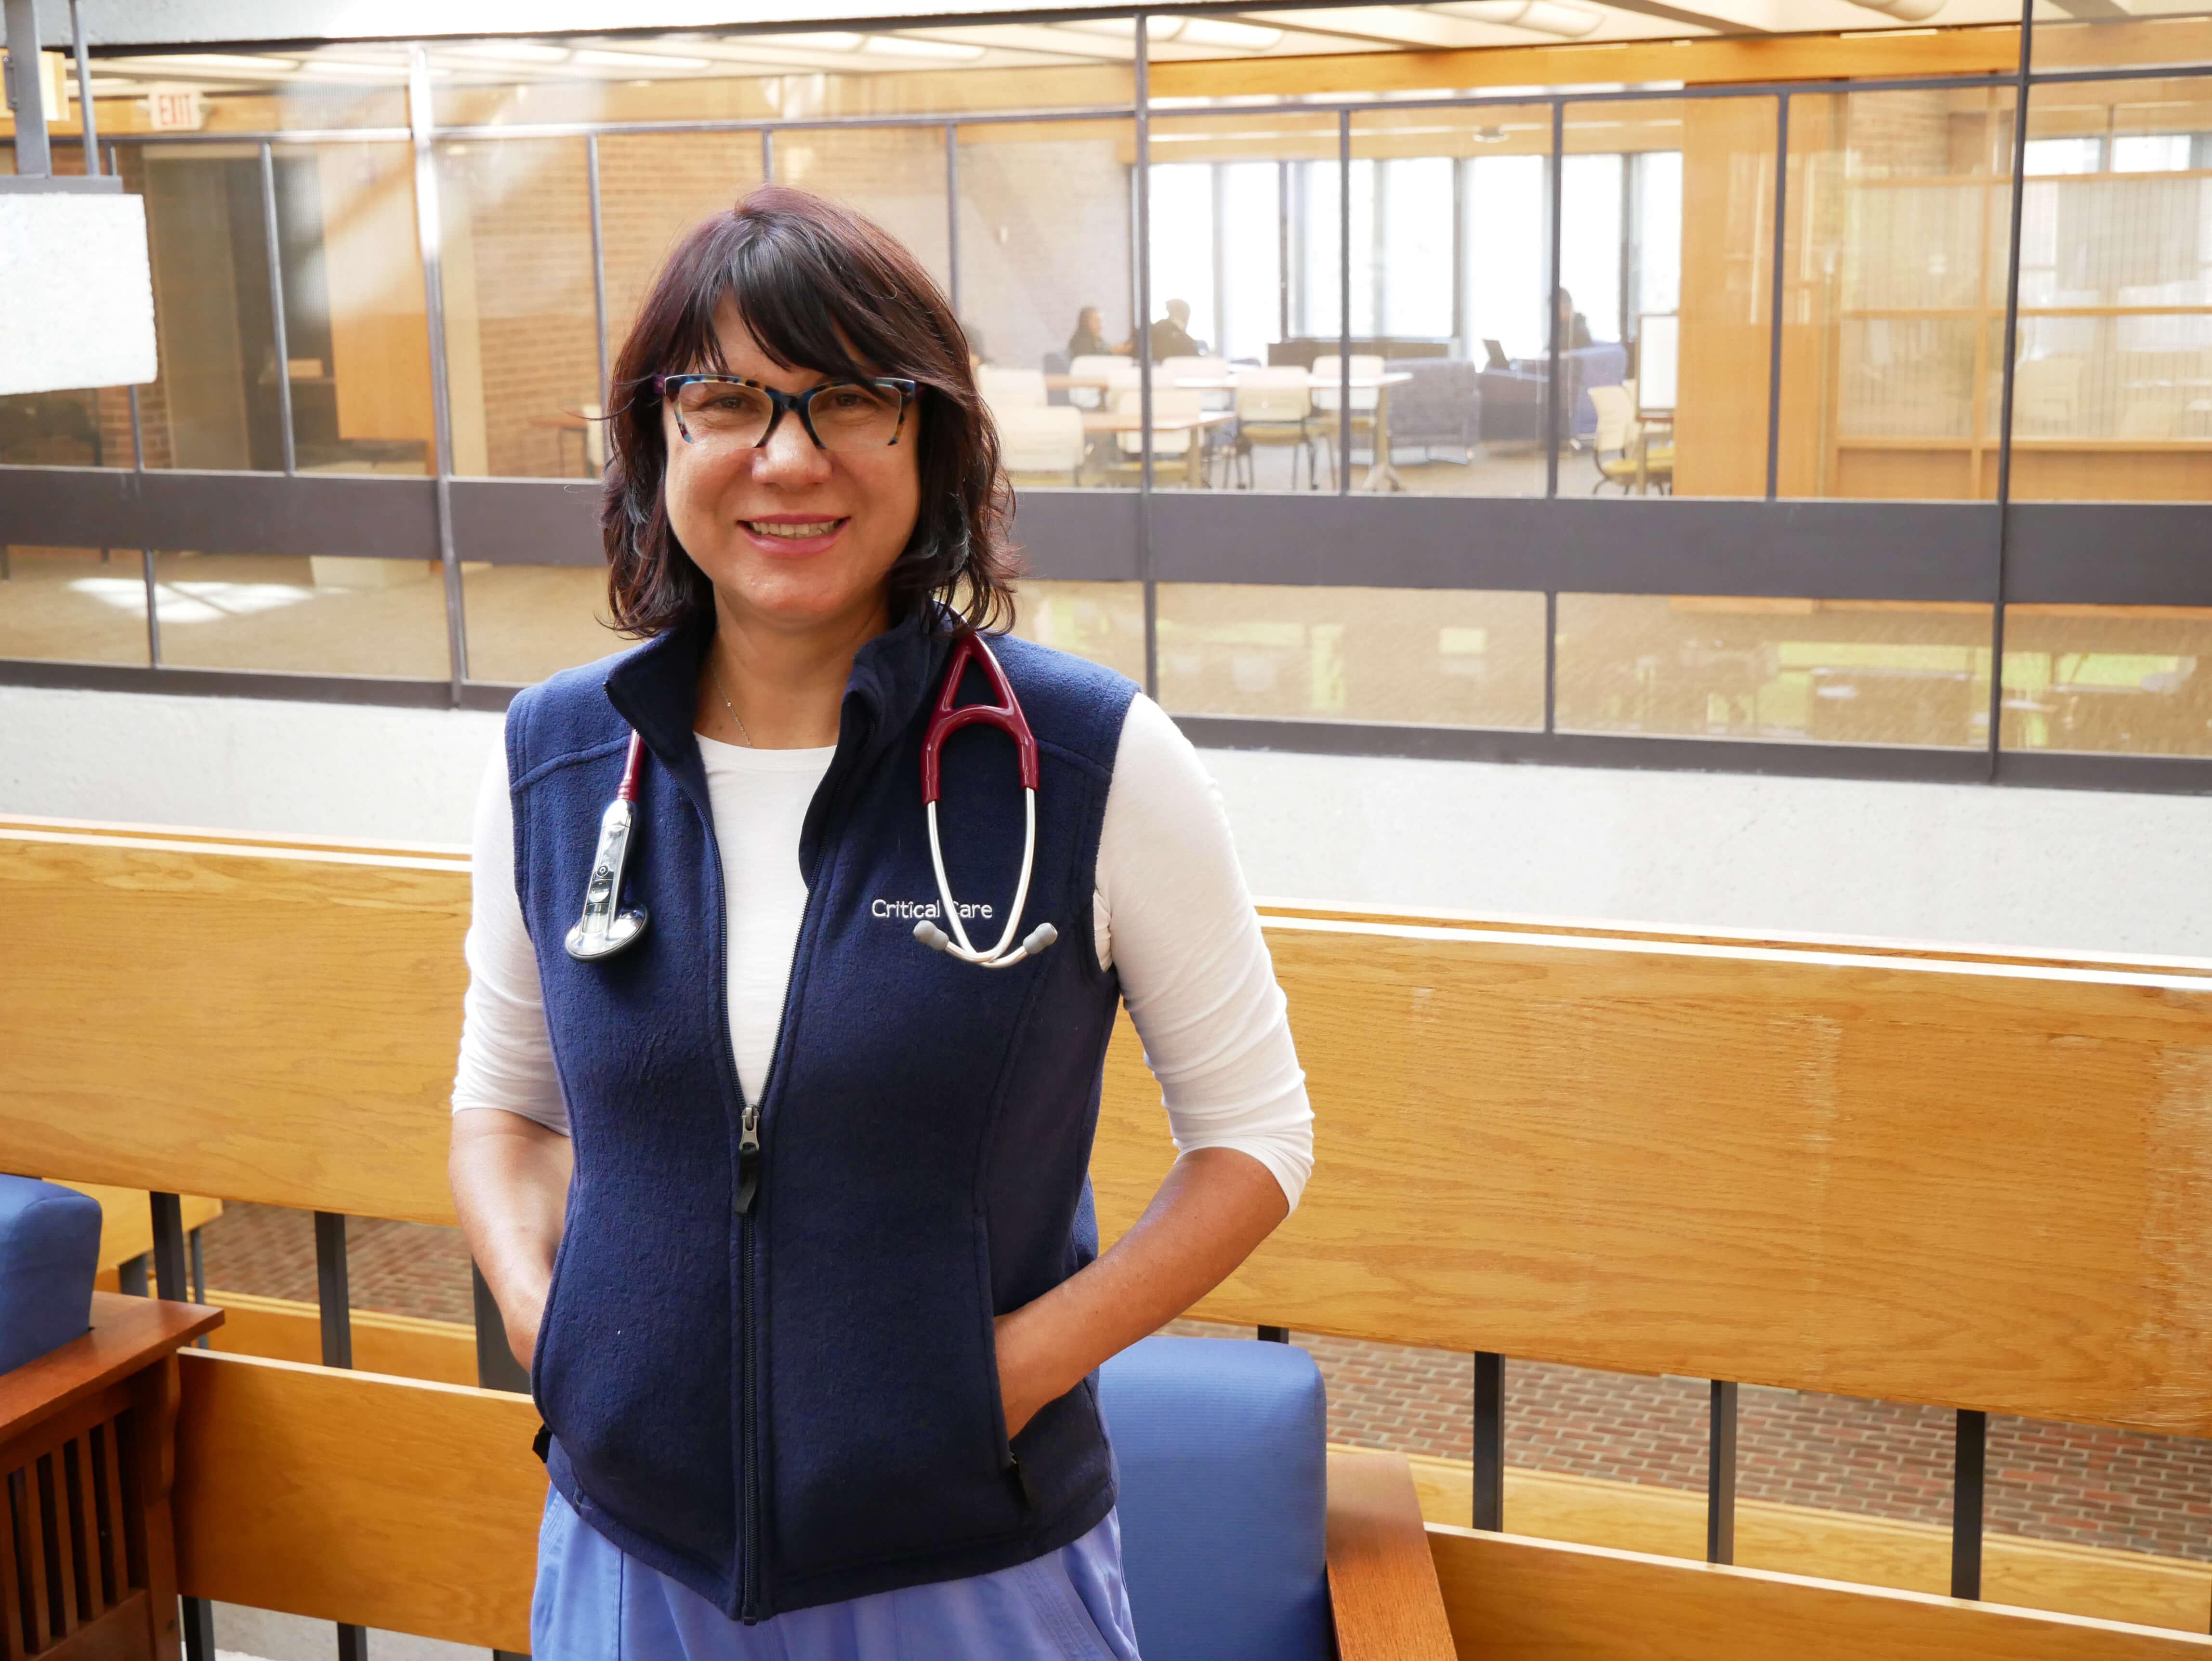 Photo of Oksana Anohina '20, a graduate student in the MSN in nursing education program